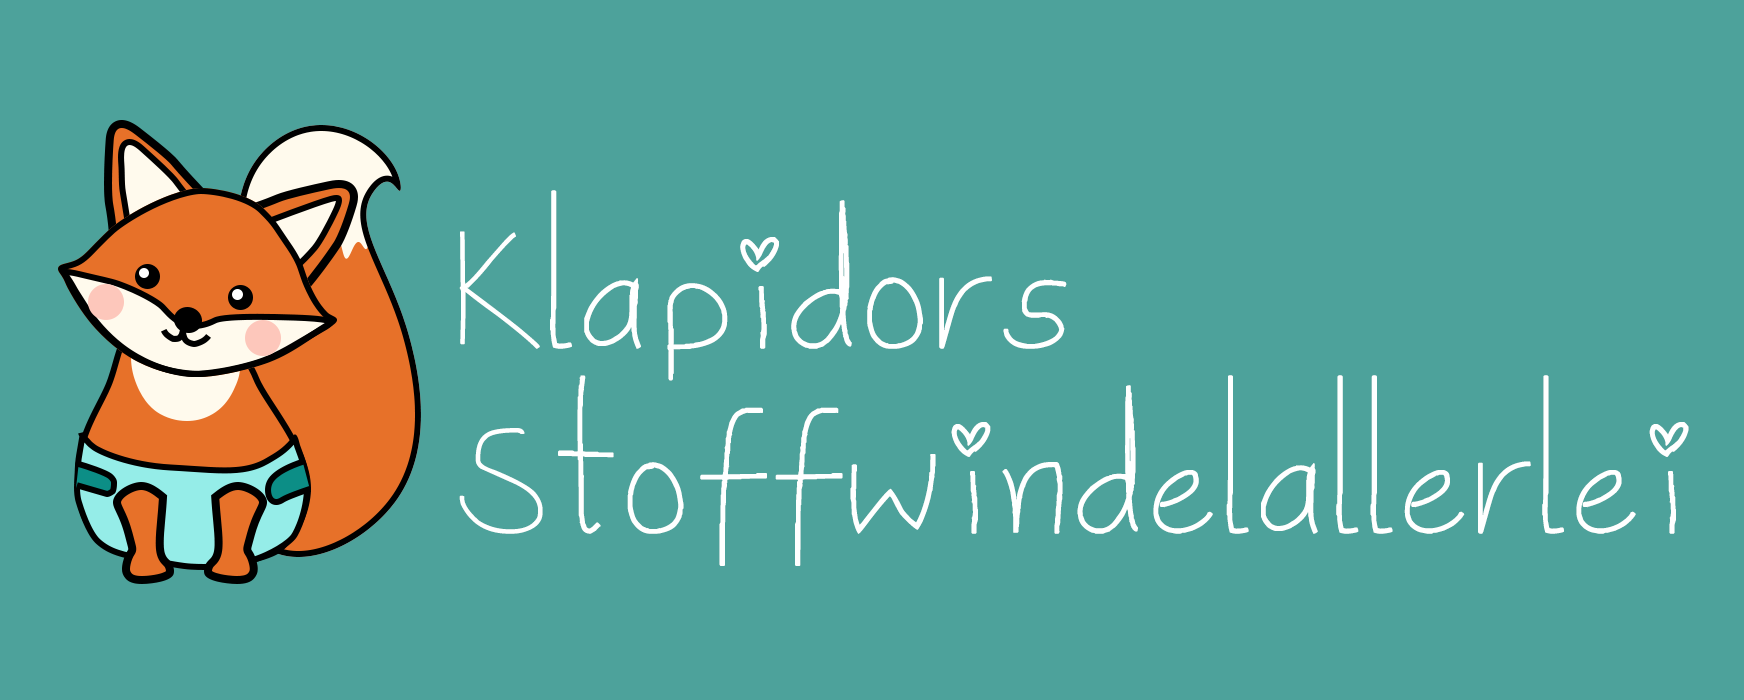 Klapidors Stoffwindelallerlei-Logo